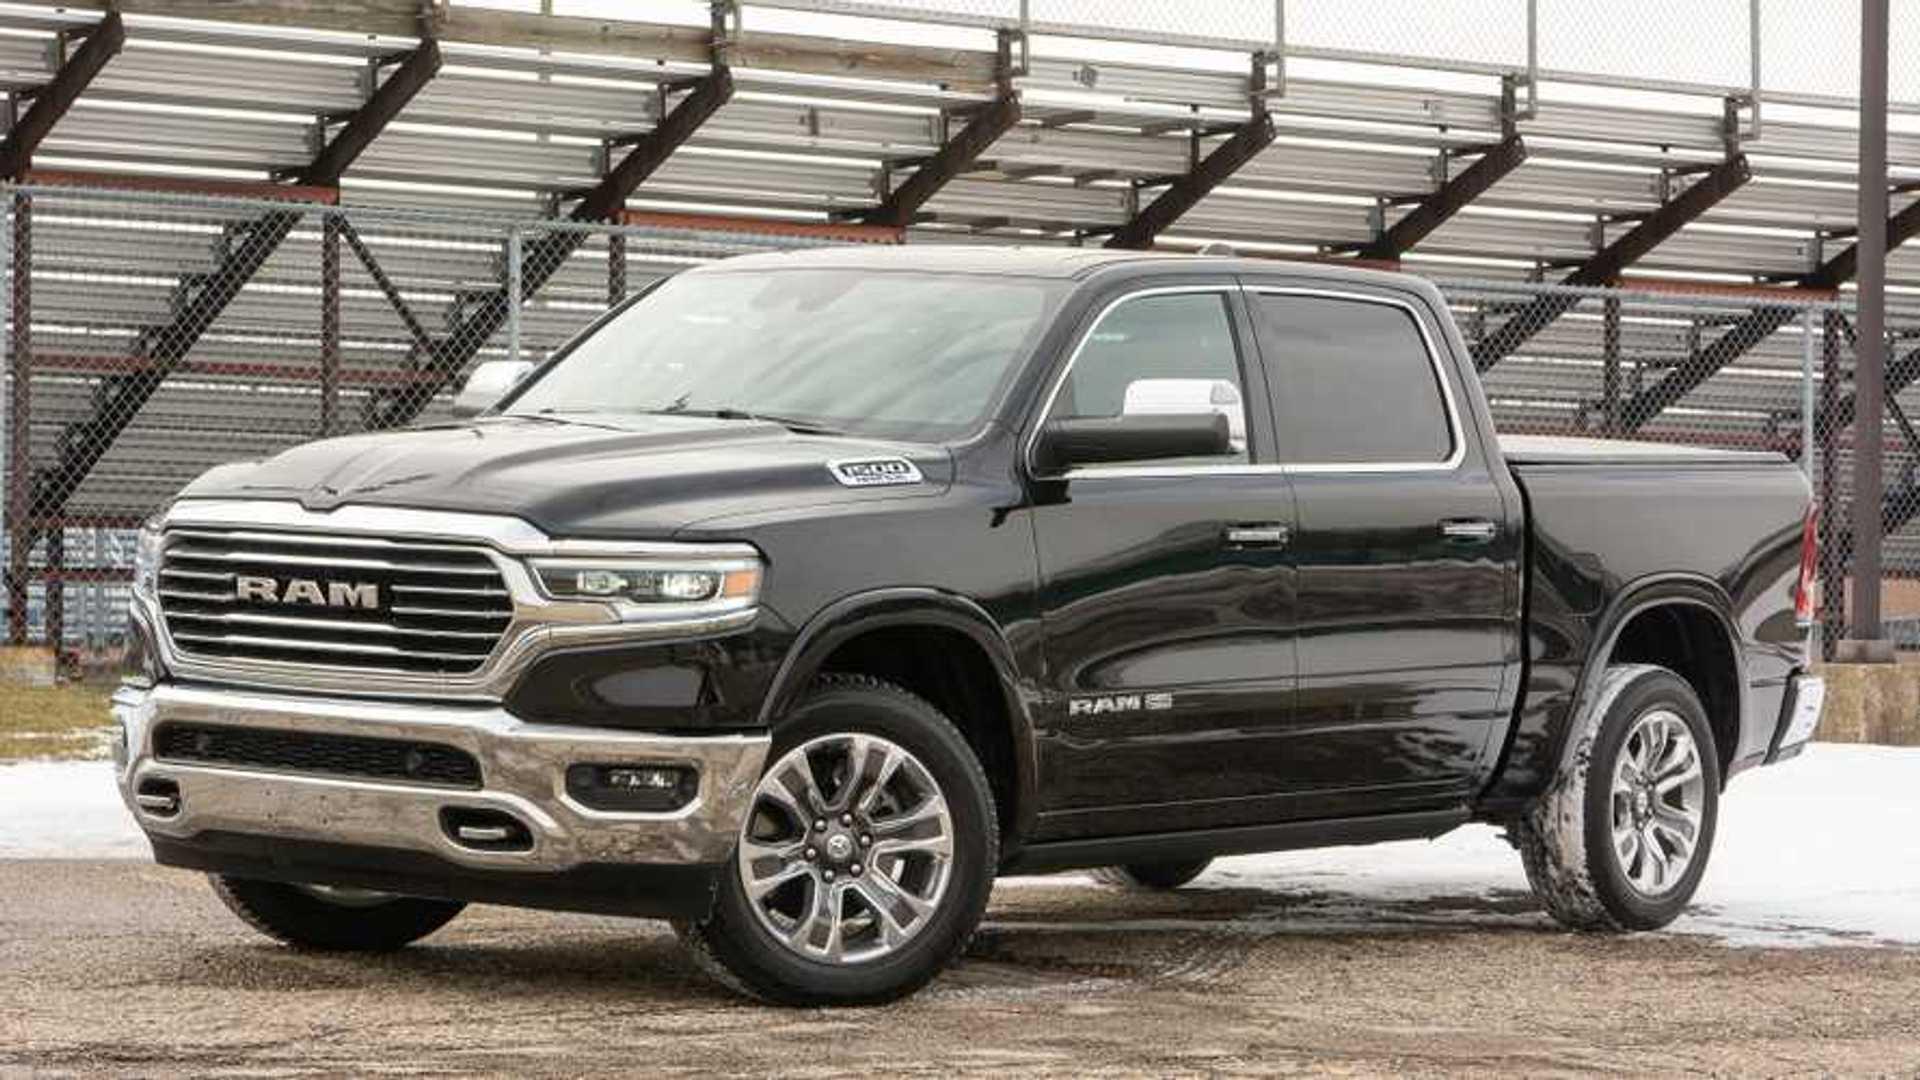 Second Quarter Truck Sales Show Ram Soaring, F-Series Still